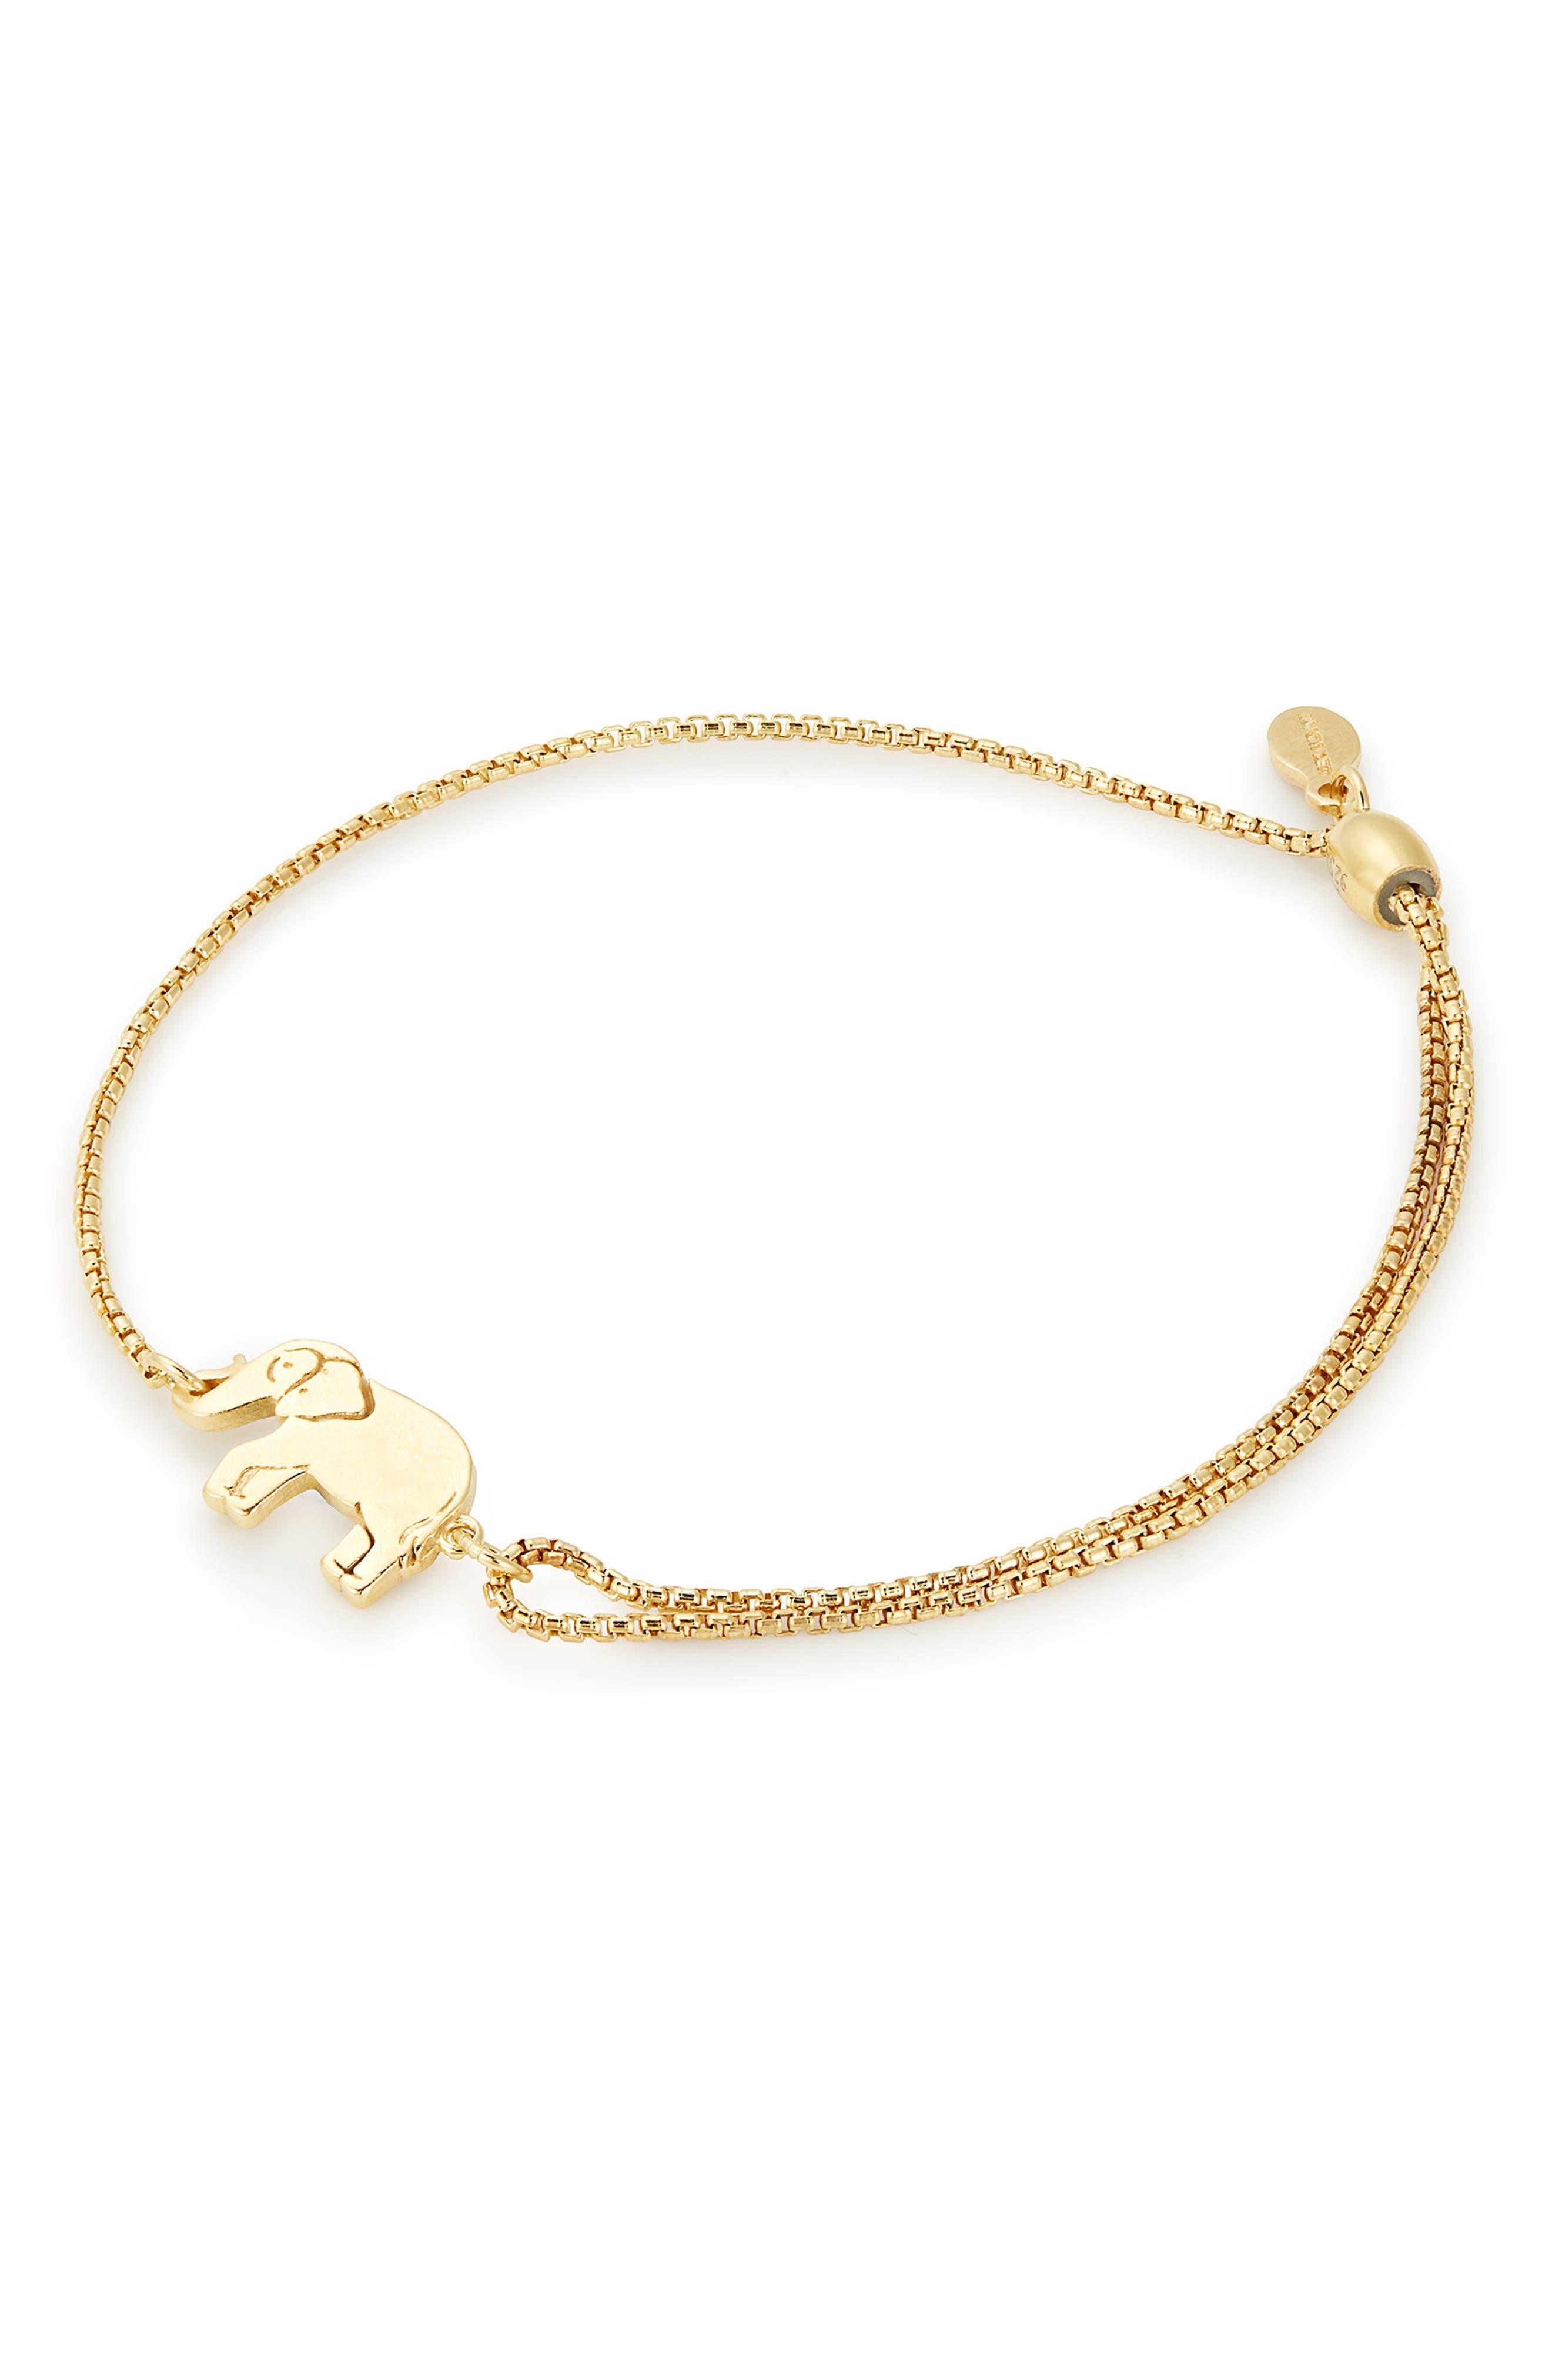 ALEX AND ANI Elephant Pull Chain Bracelet, Main, color, 710